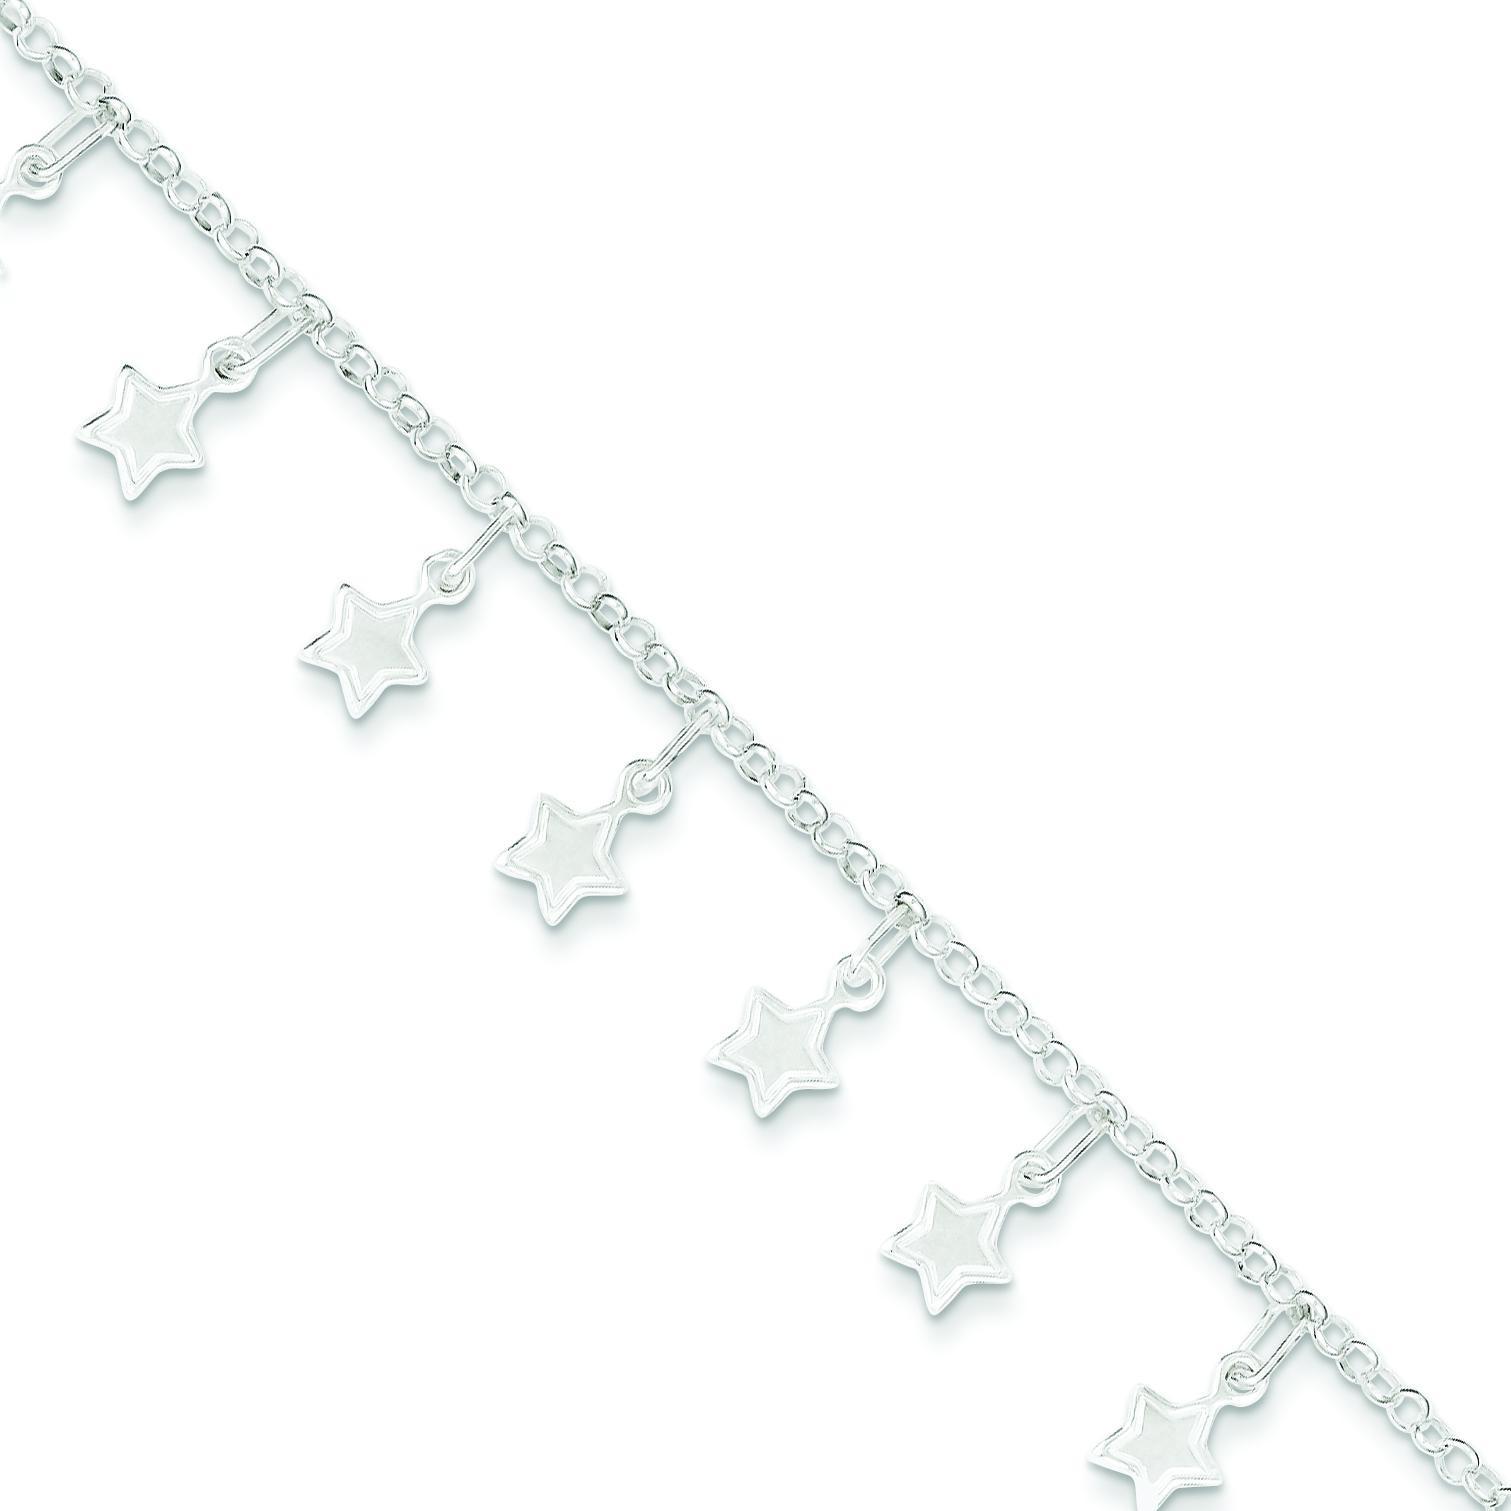 Stars Bracelet in Sterling Silver